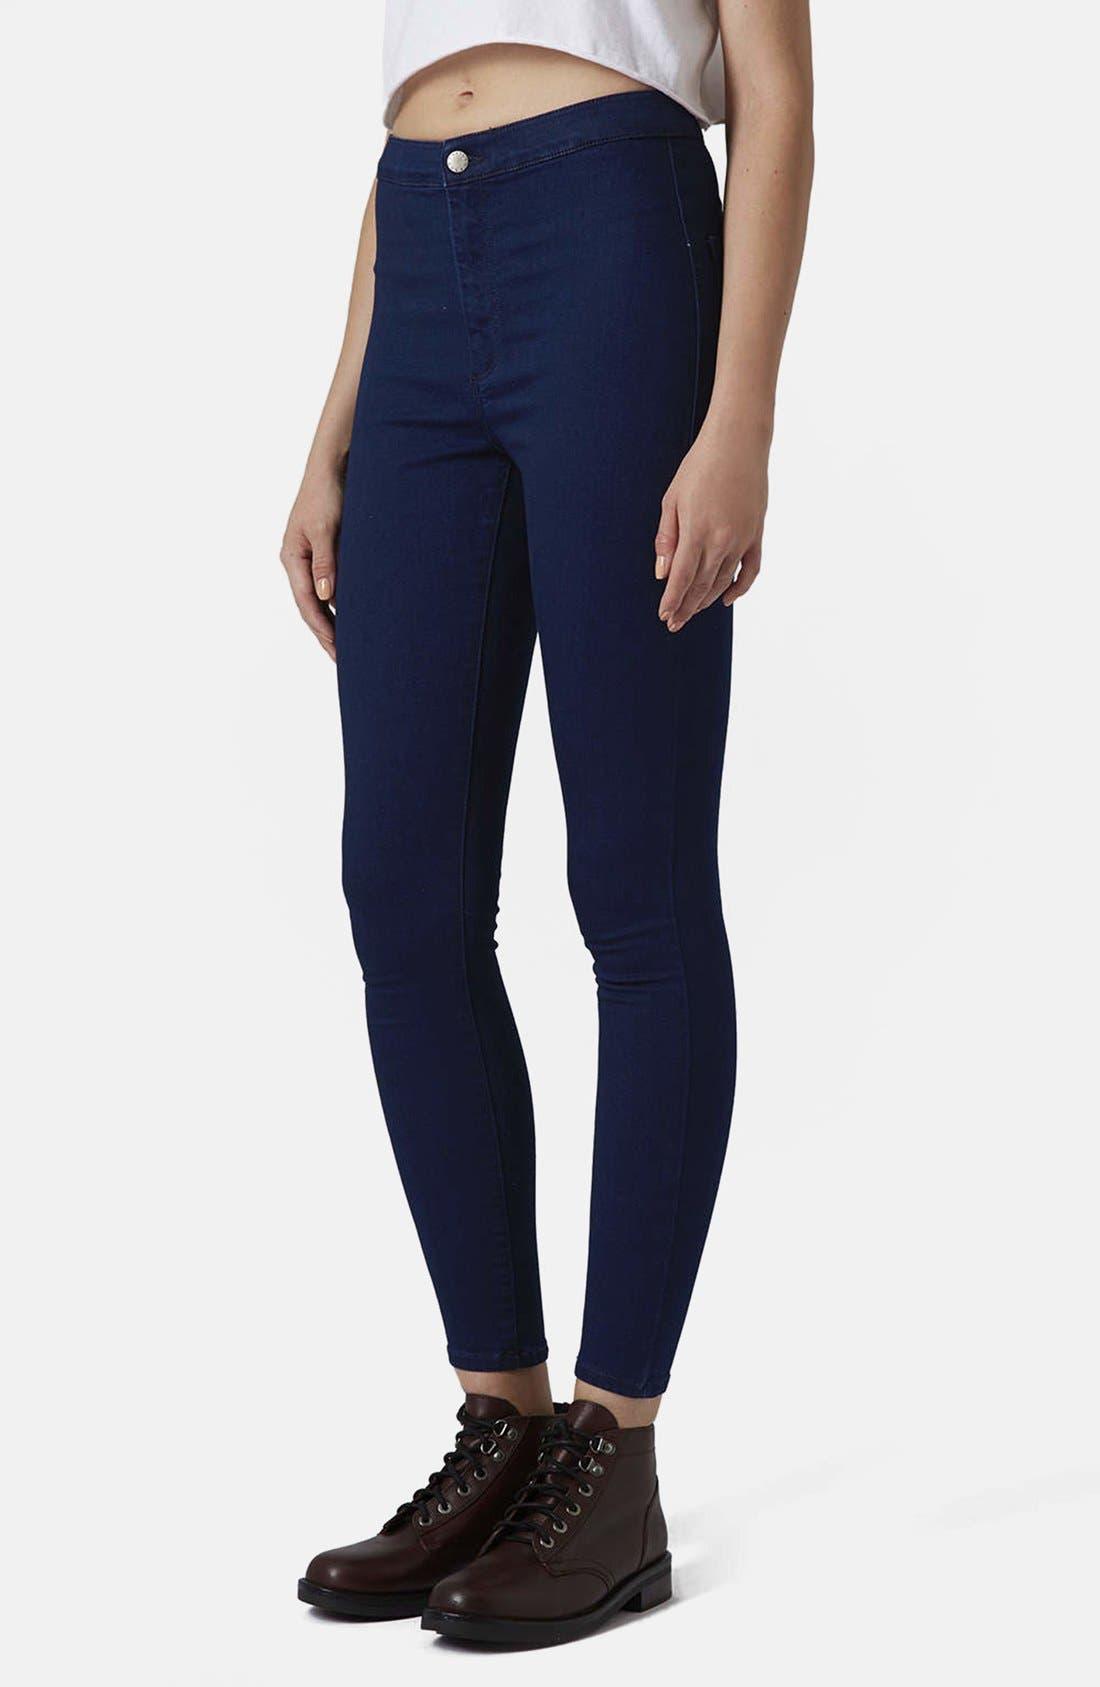 Alternate Image 1 Selected - Topshop Moto 'Joni' High Waist Skinny Jeans (Blue)